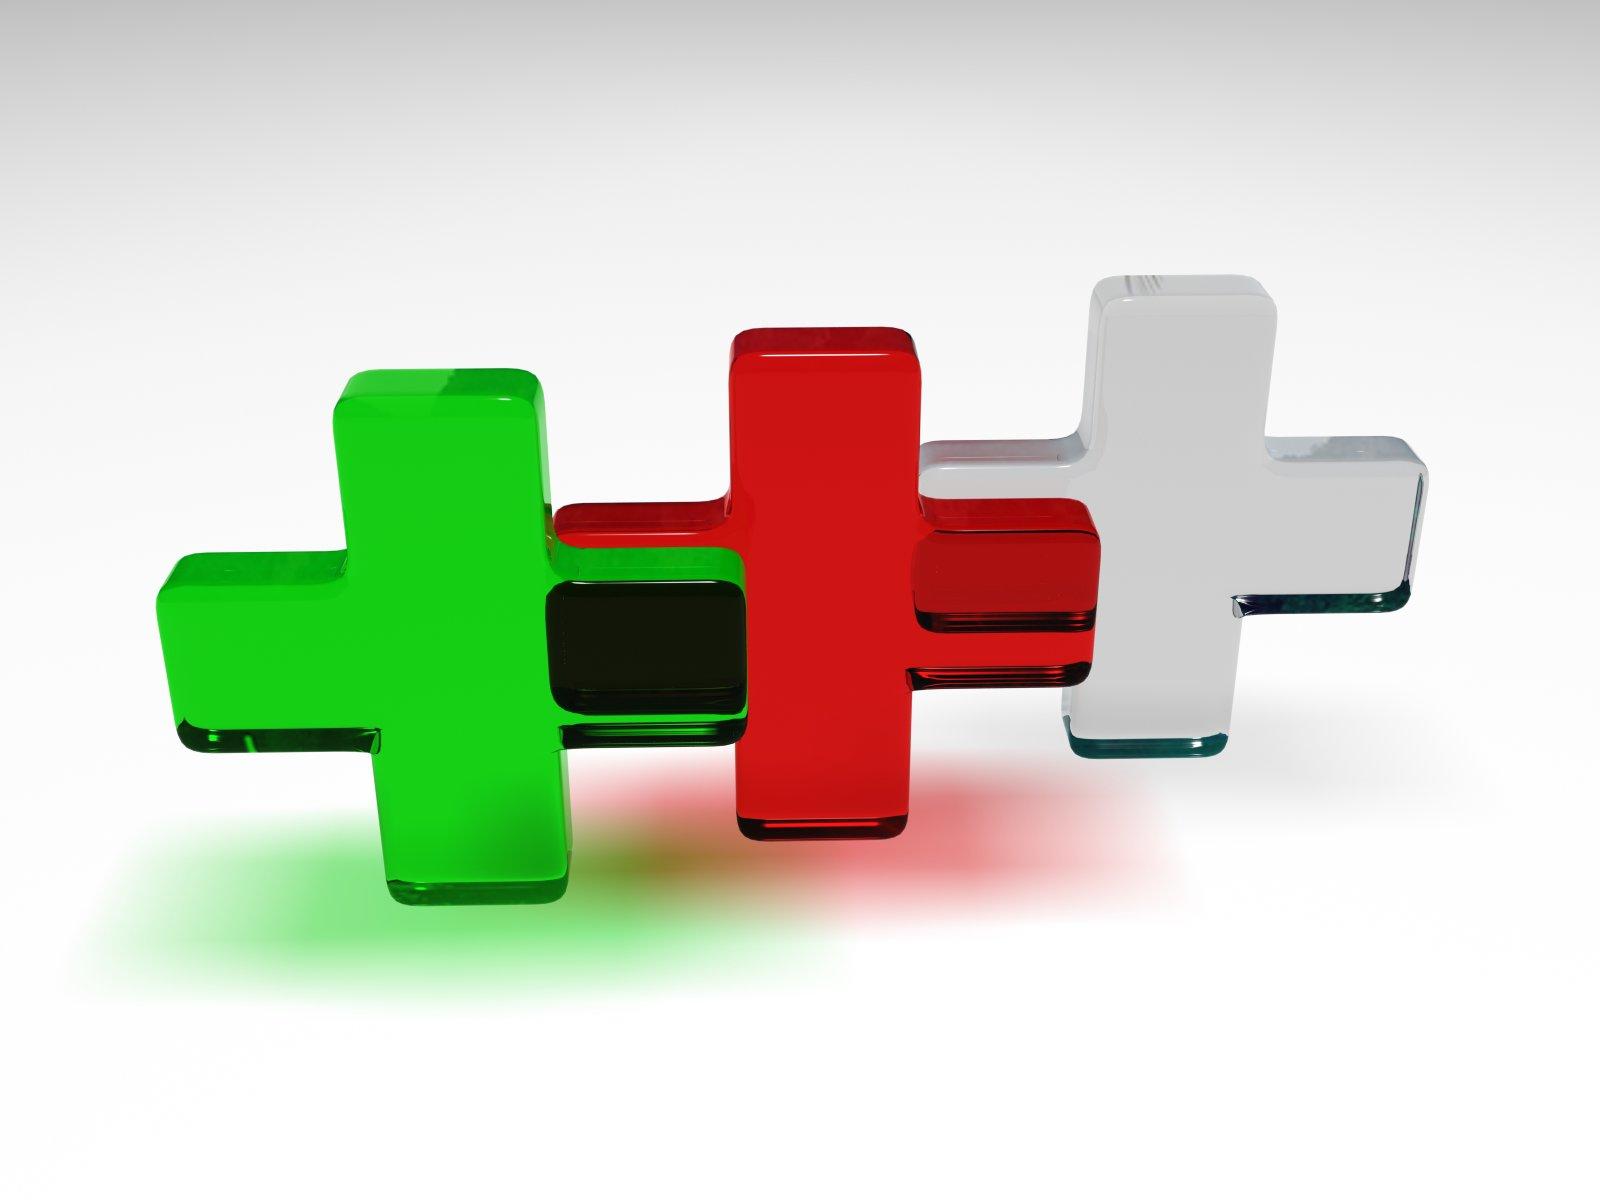 Medical Symbol Desktop Wallpaper Pictures Photos 1600x1200